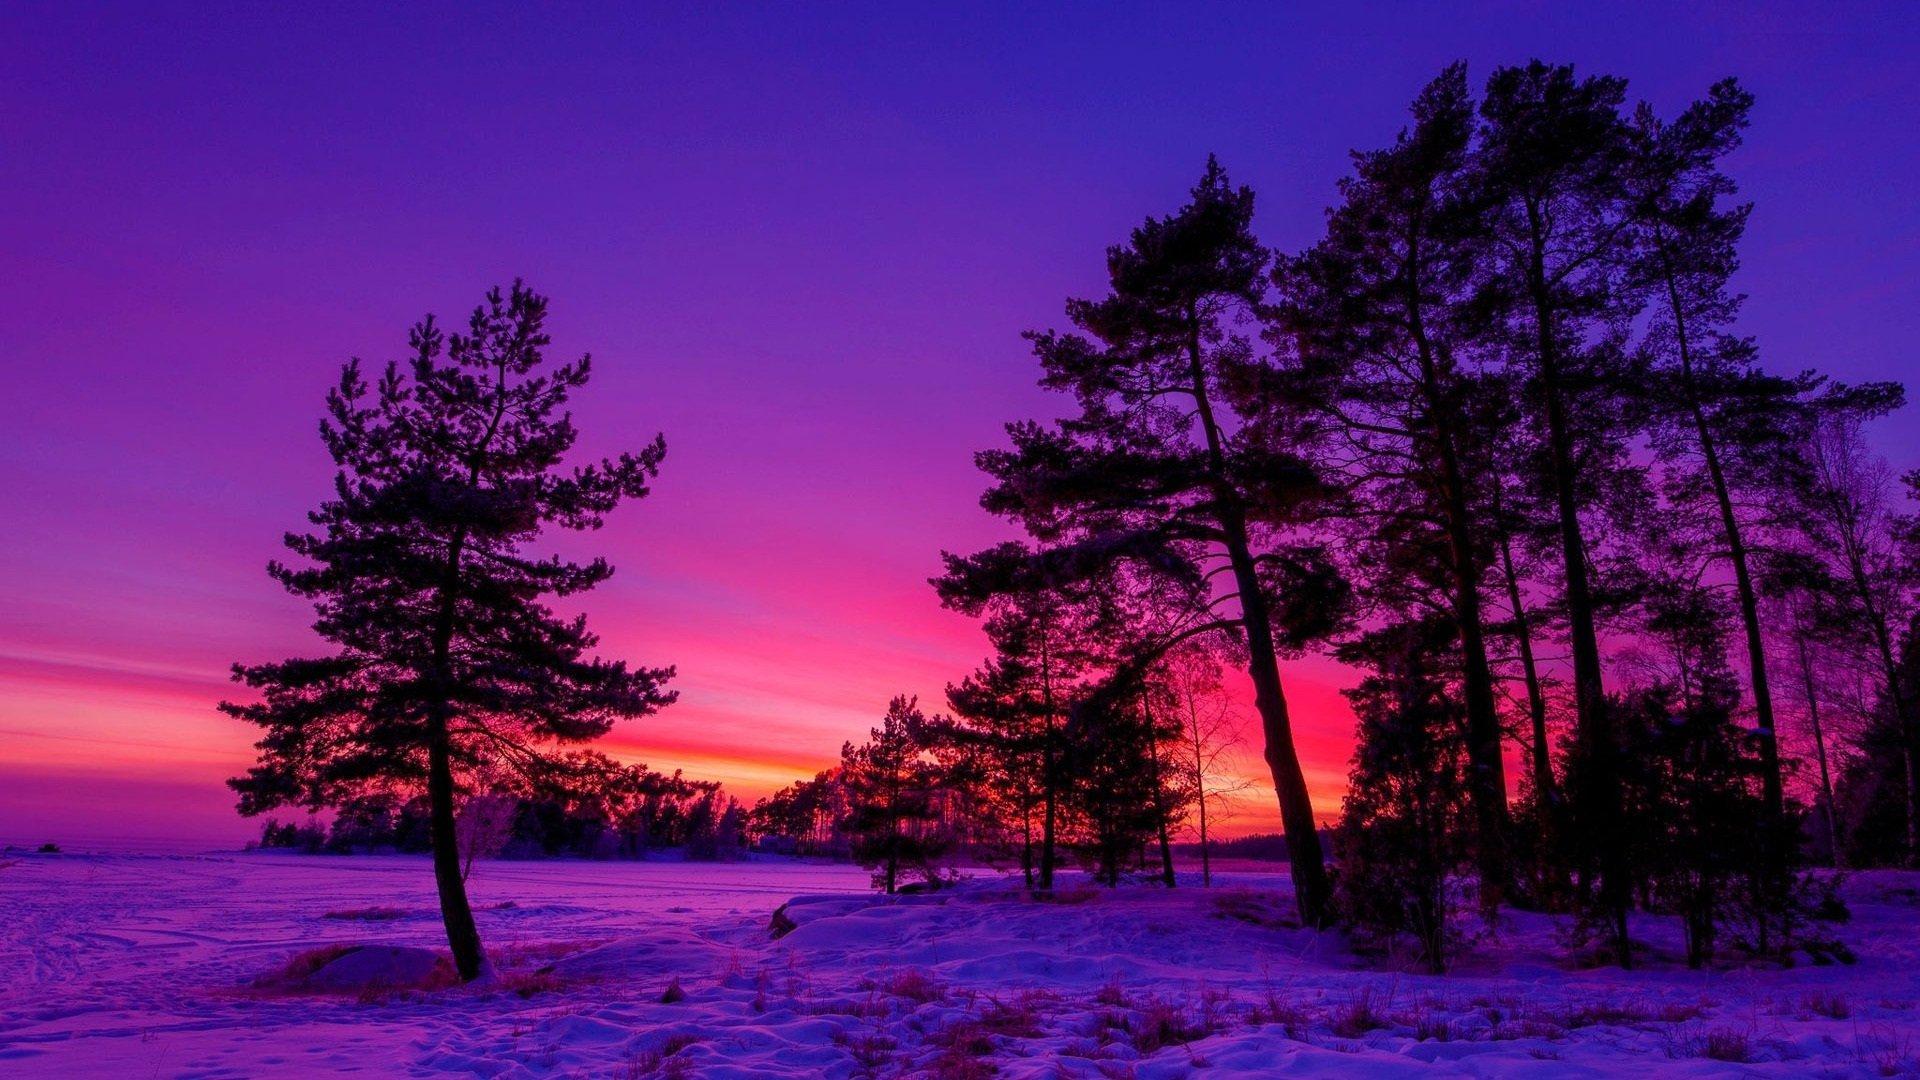 Winter sunset hd wallpaper background image 1920x1080 - Wallpaper hd nature winter ...